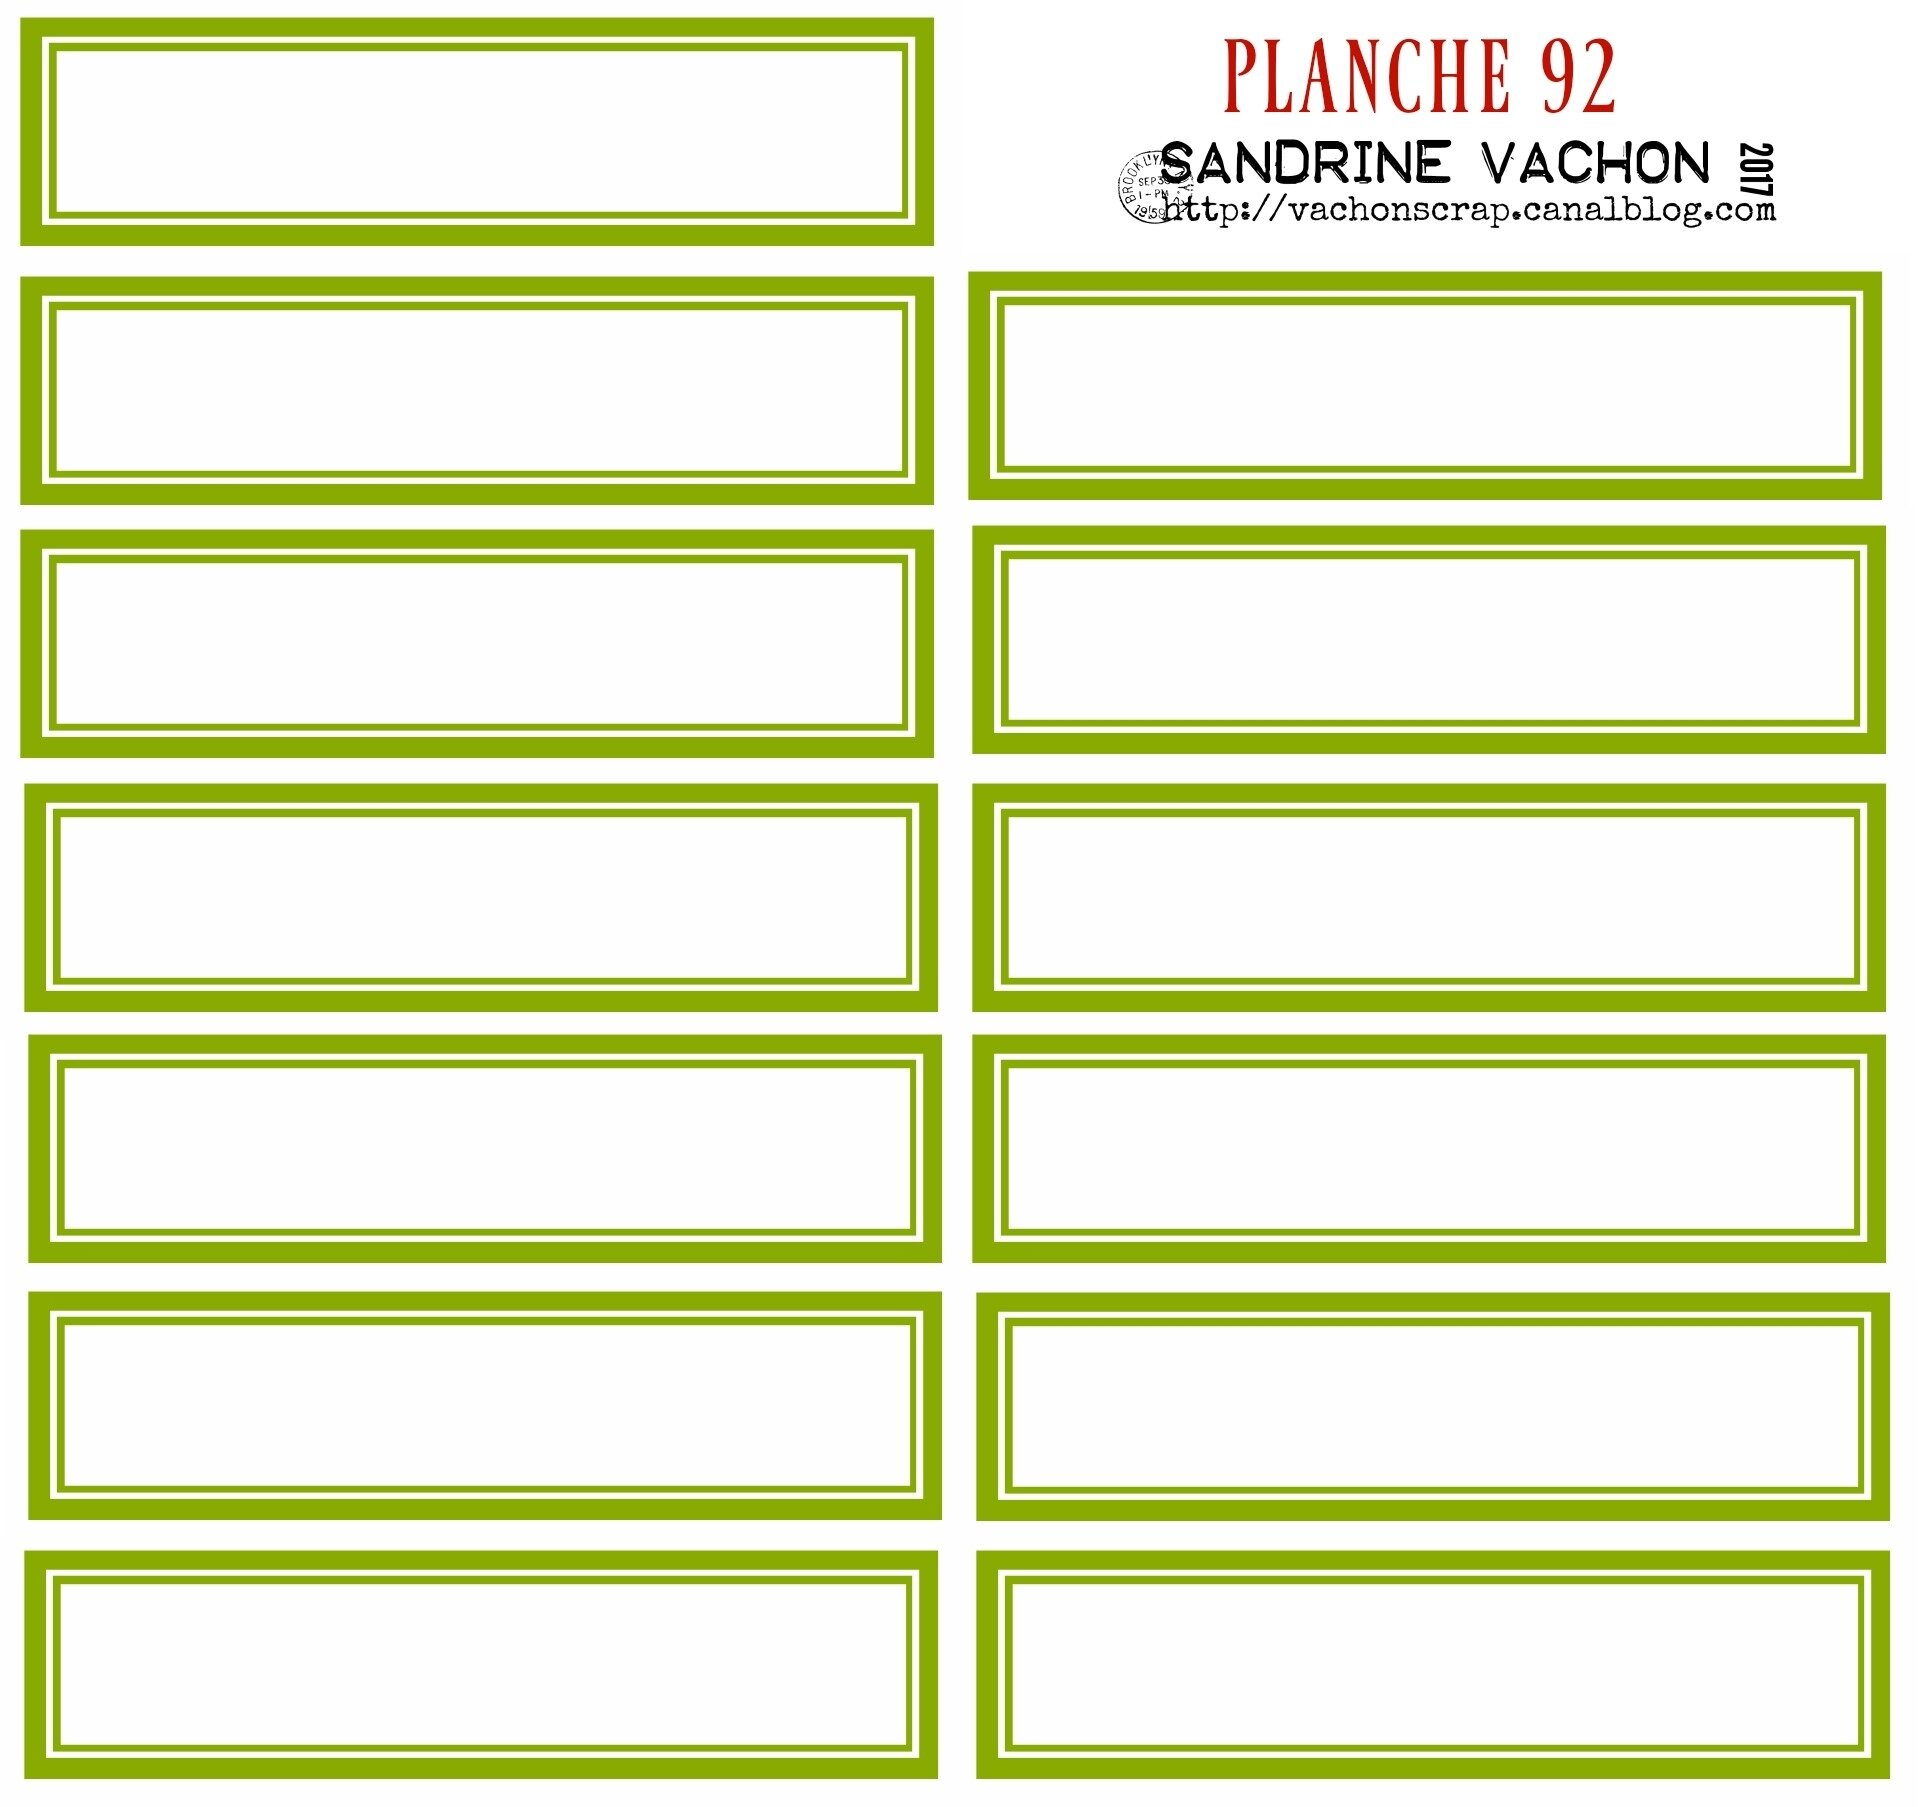 PLANCHE 92 VERT